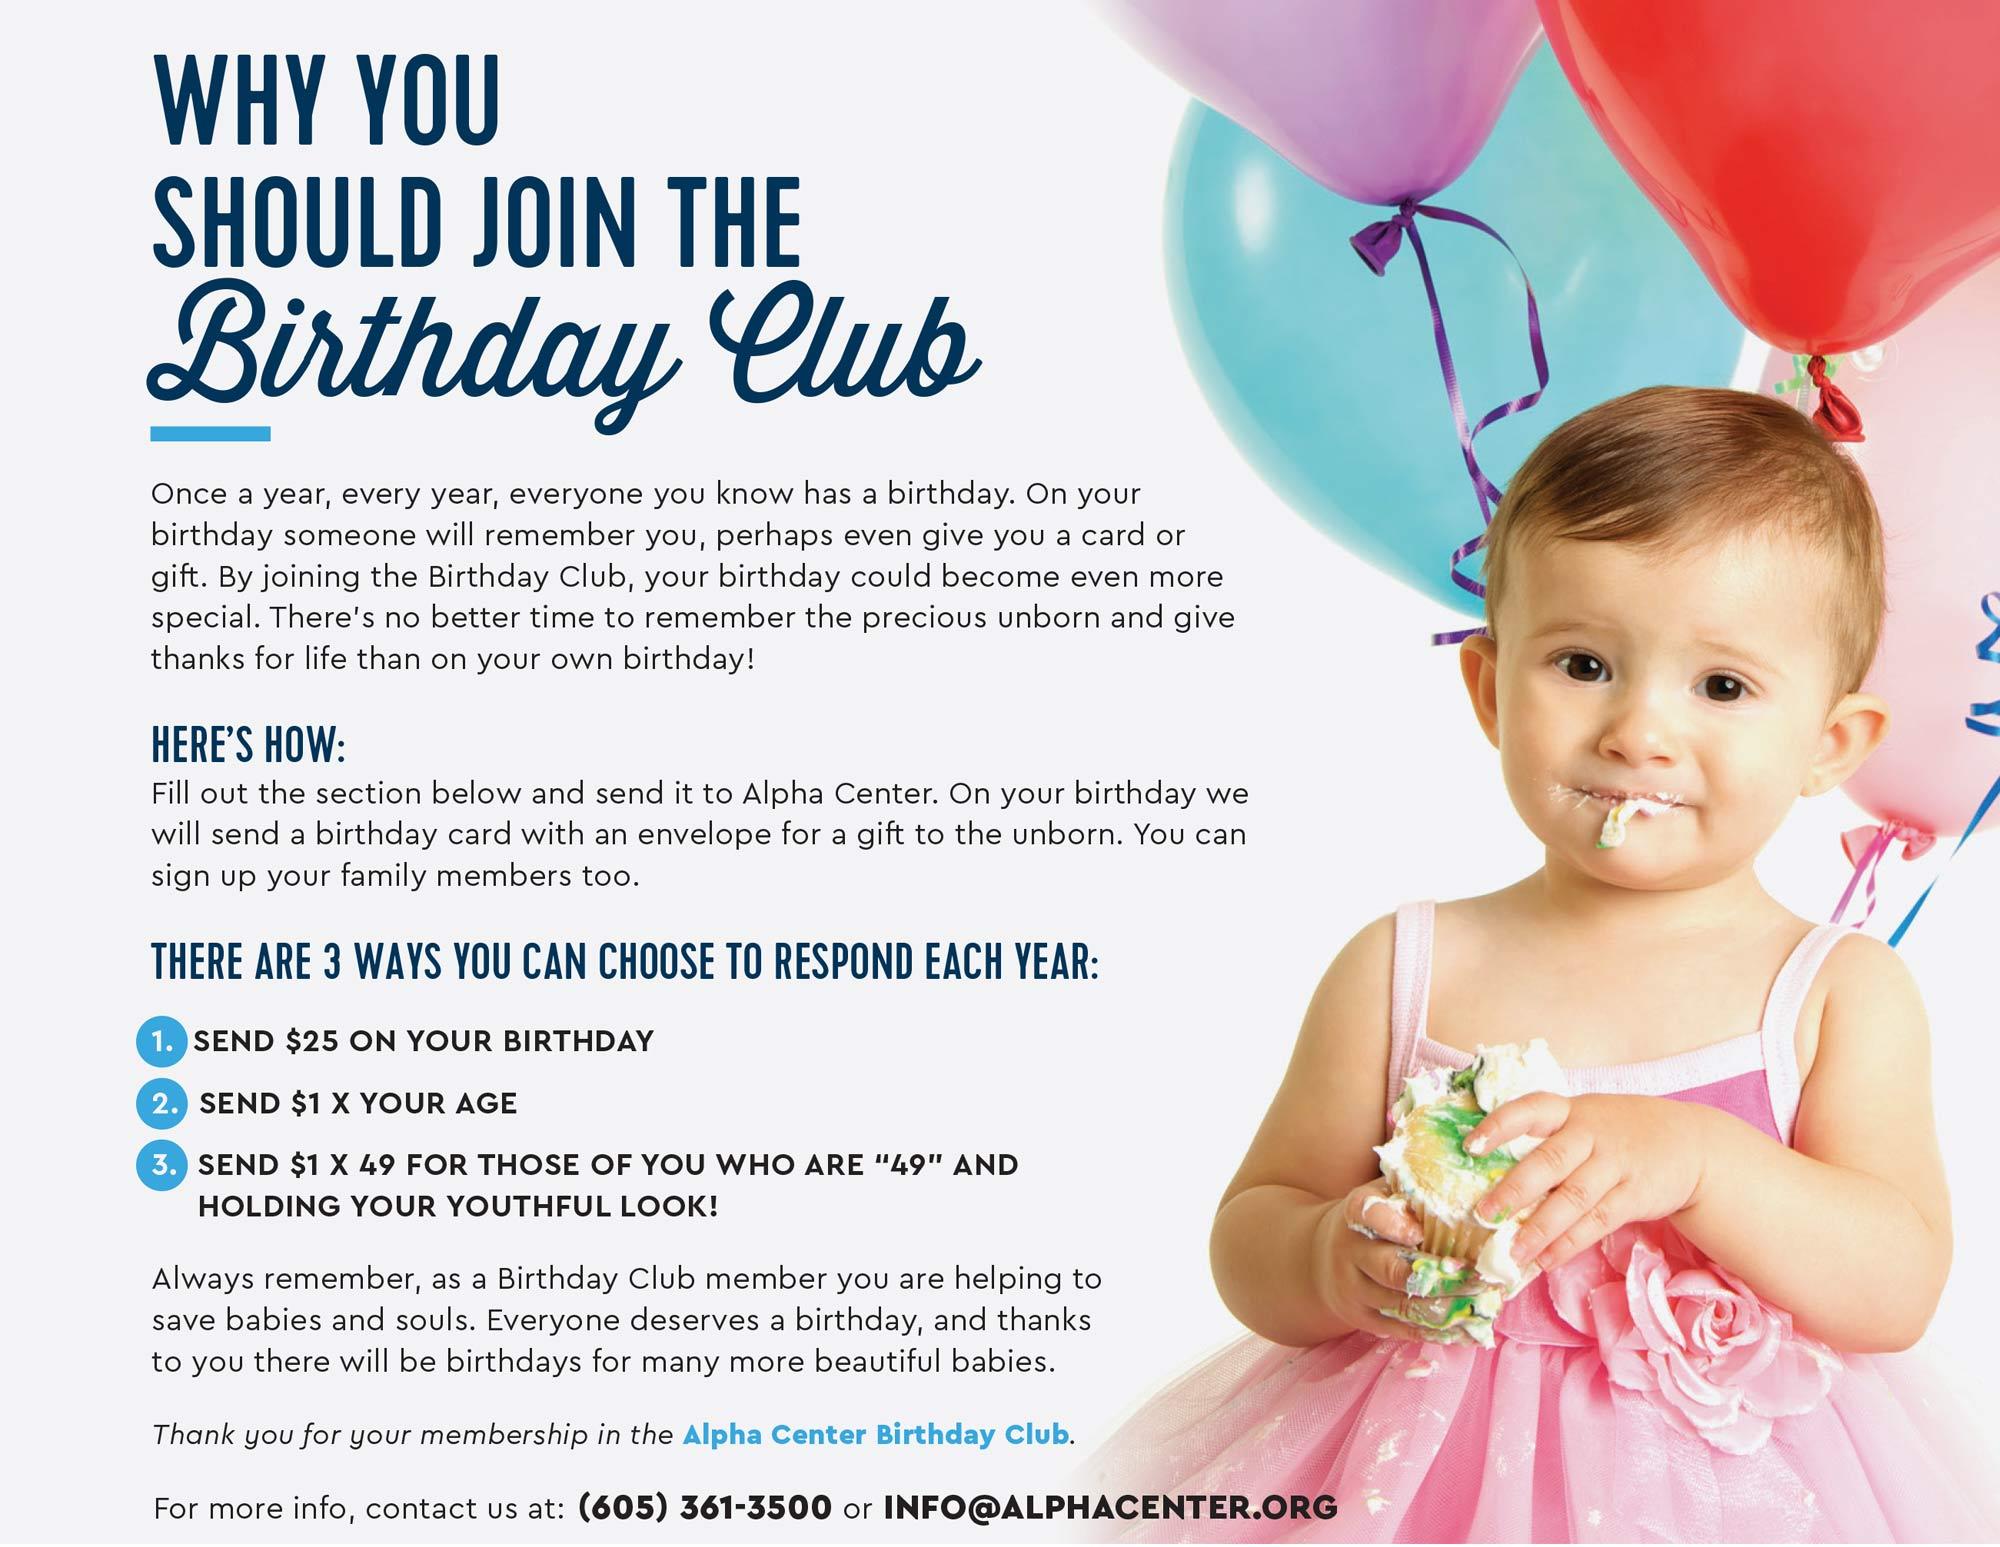 childrens own birthday club